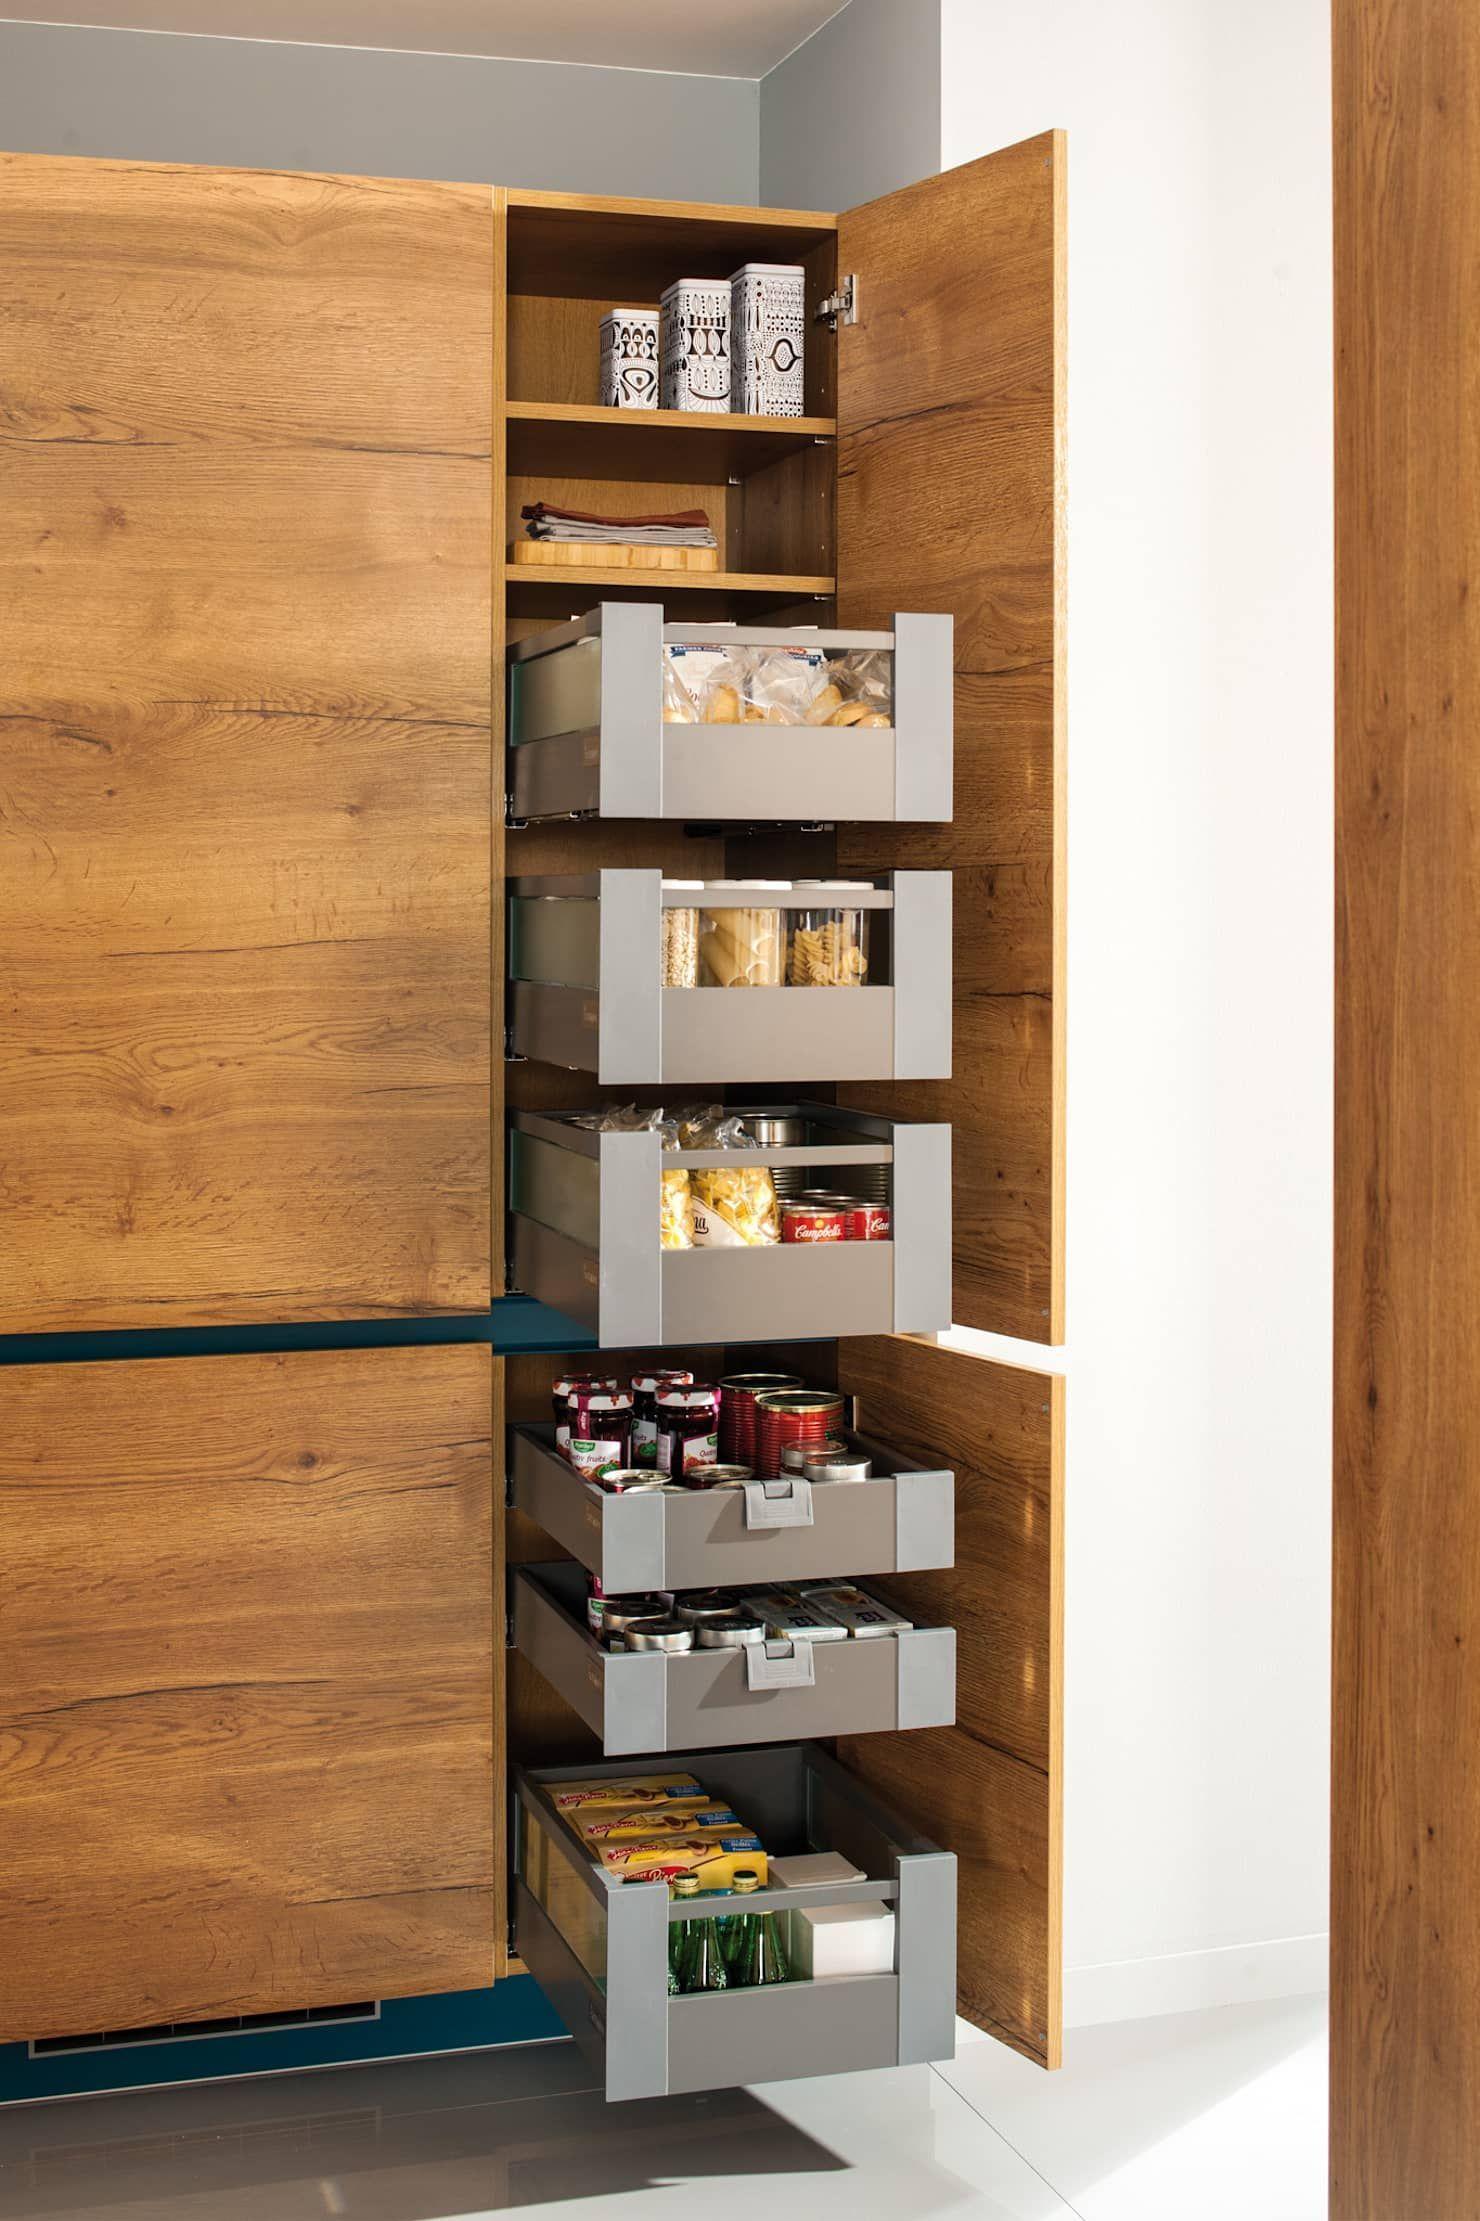 Photo of Platz da!: modern von schmidt küchen,modern – https://makalemerkez.com/dekor